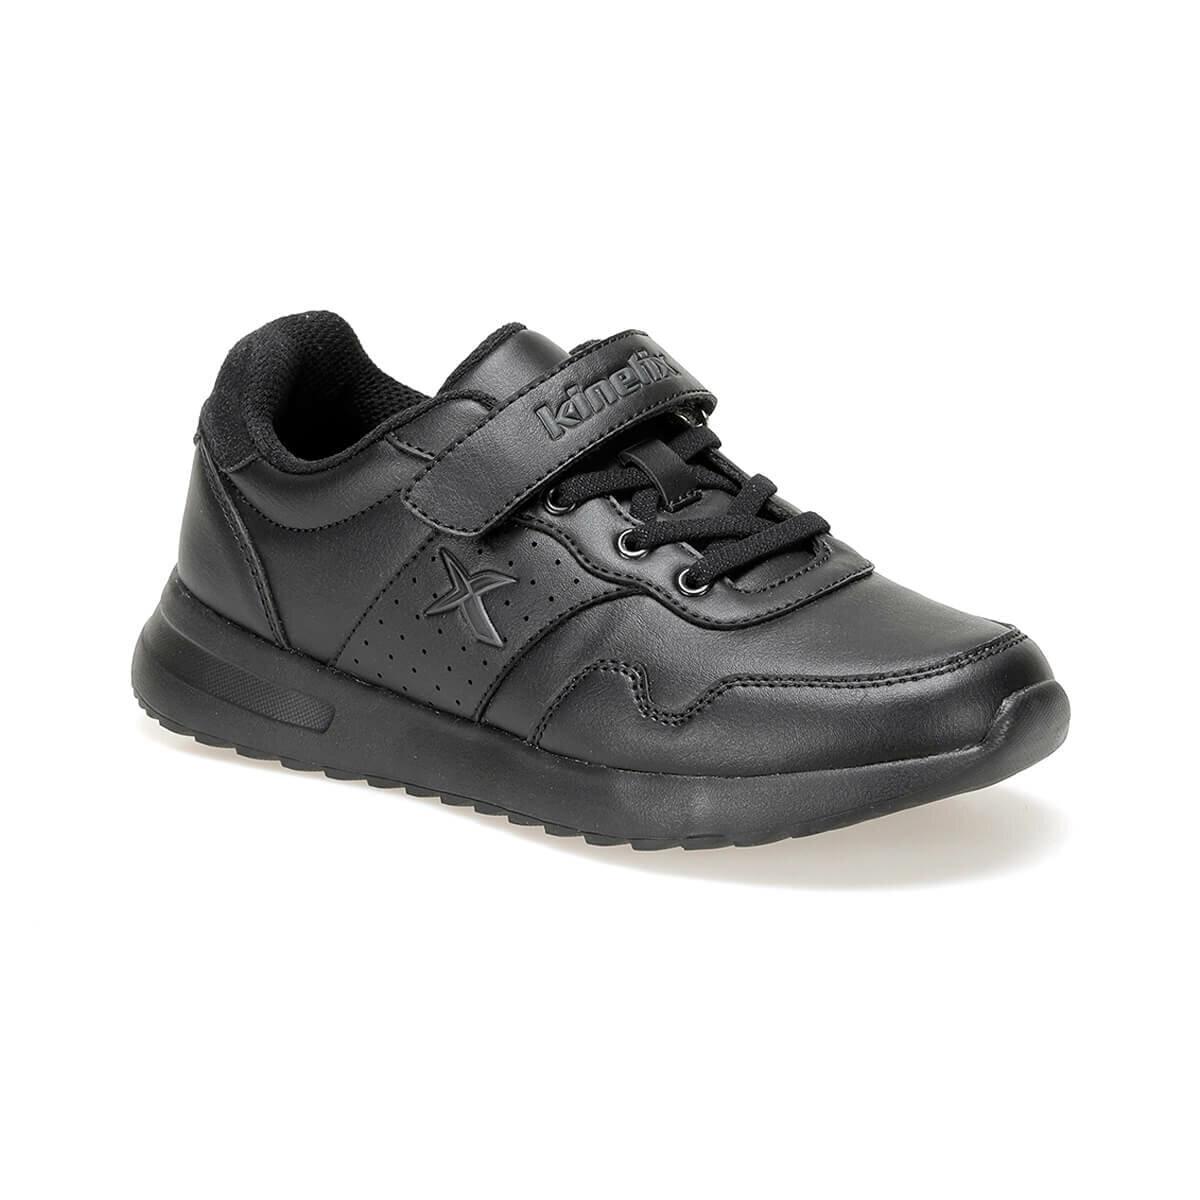 FLO FABIA PU J 9PR Black Male Child Sneaker Shoes KINETIX